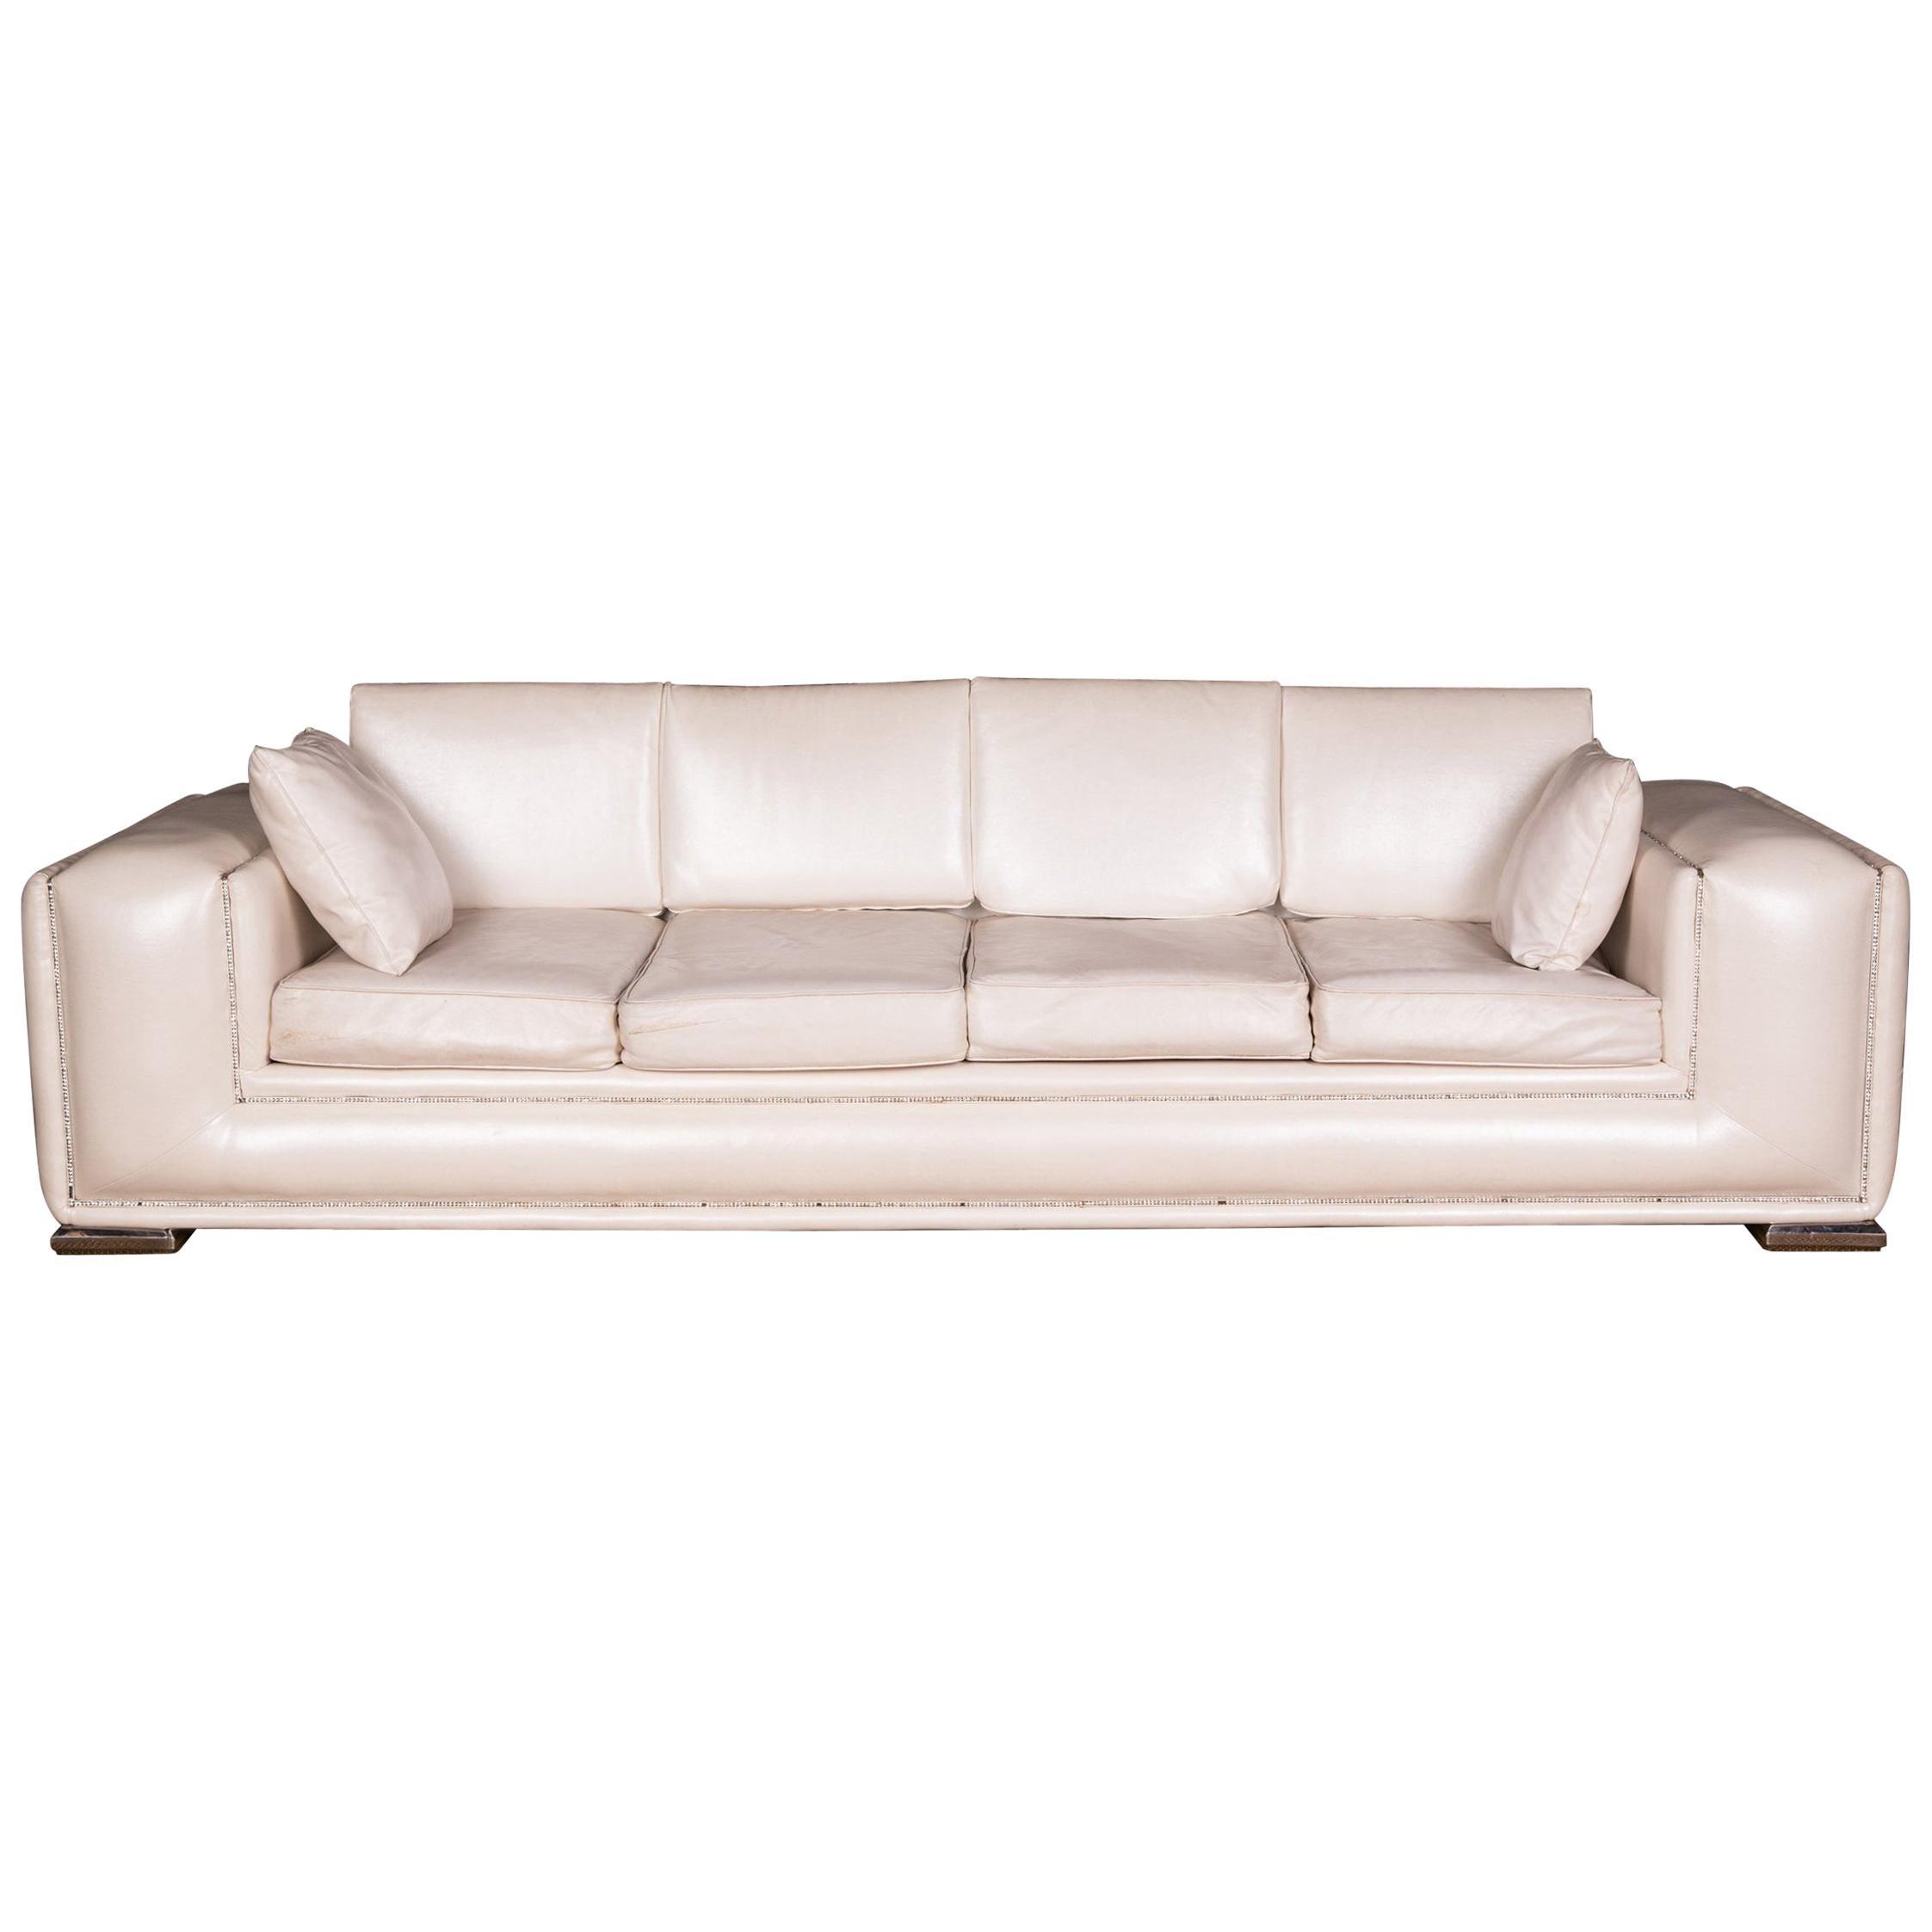 Designer Sofa Four-Seat with Swarovski Stones Rhinestones